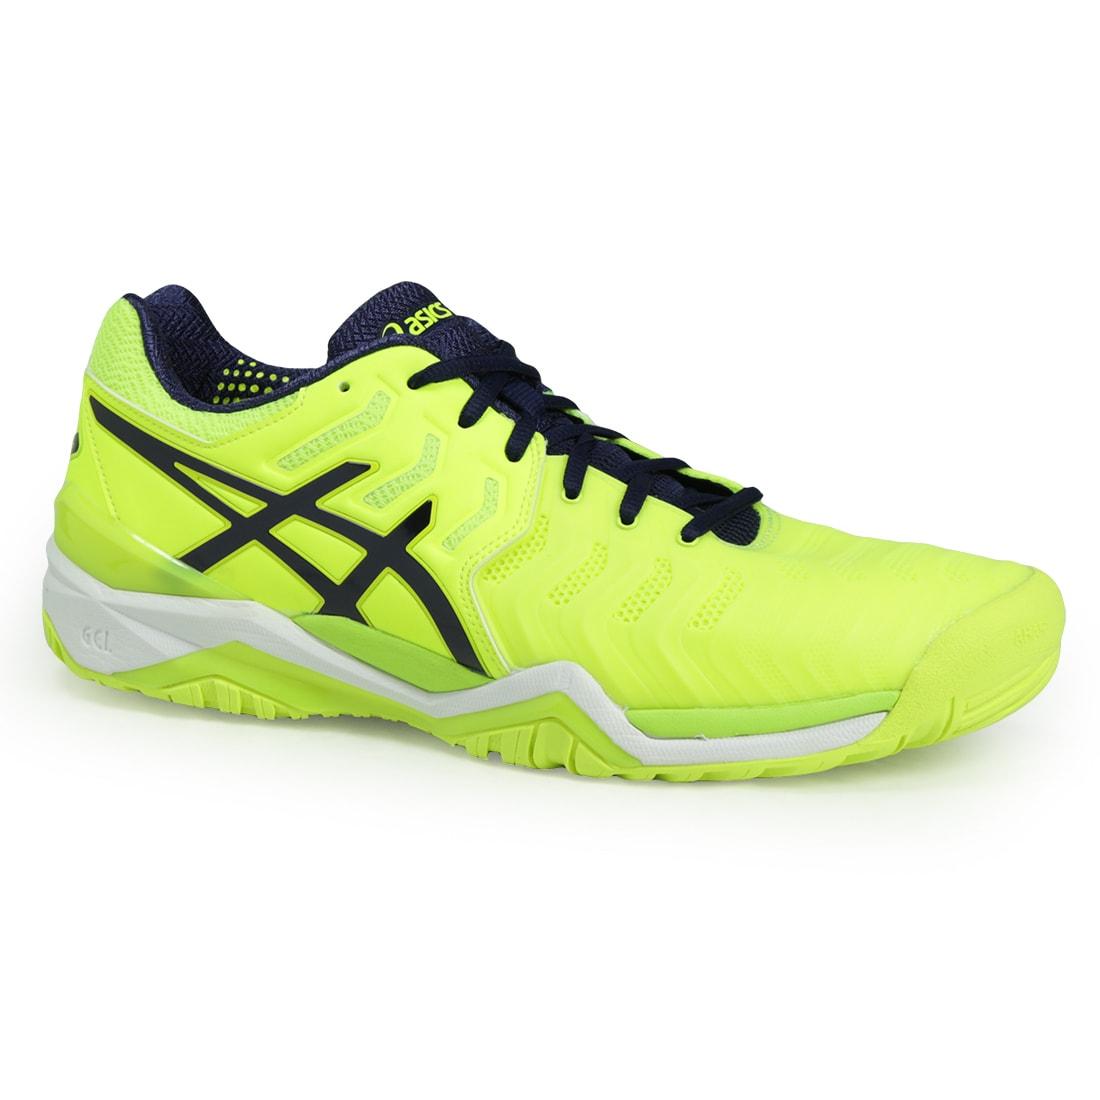 Asics Gel Resolution 7 Men's Tennis Shoe (10), Blue (Synt...